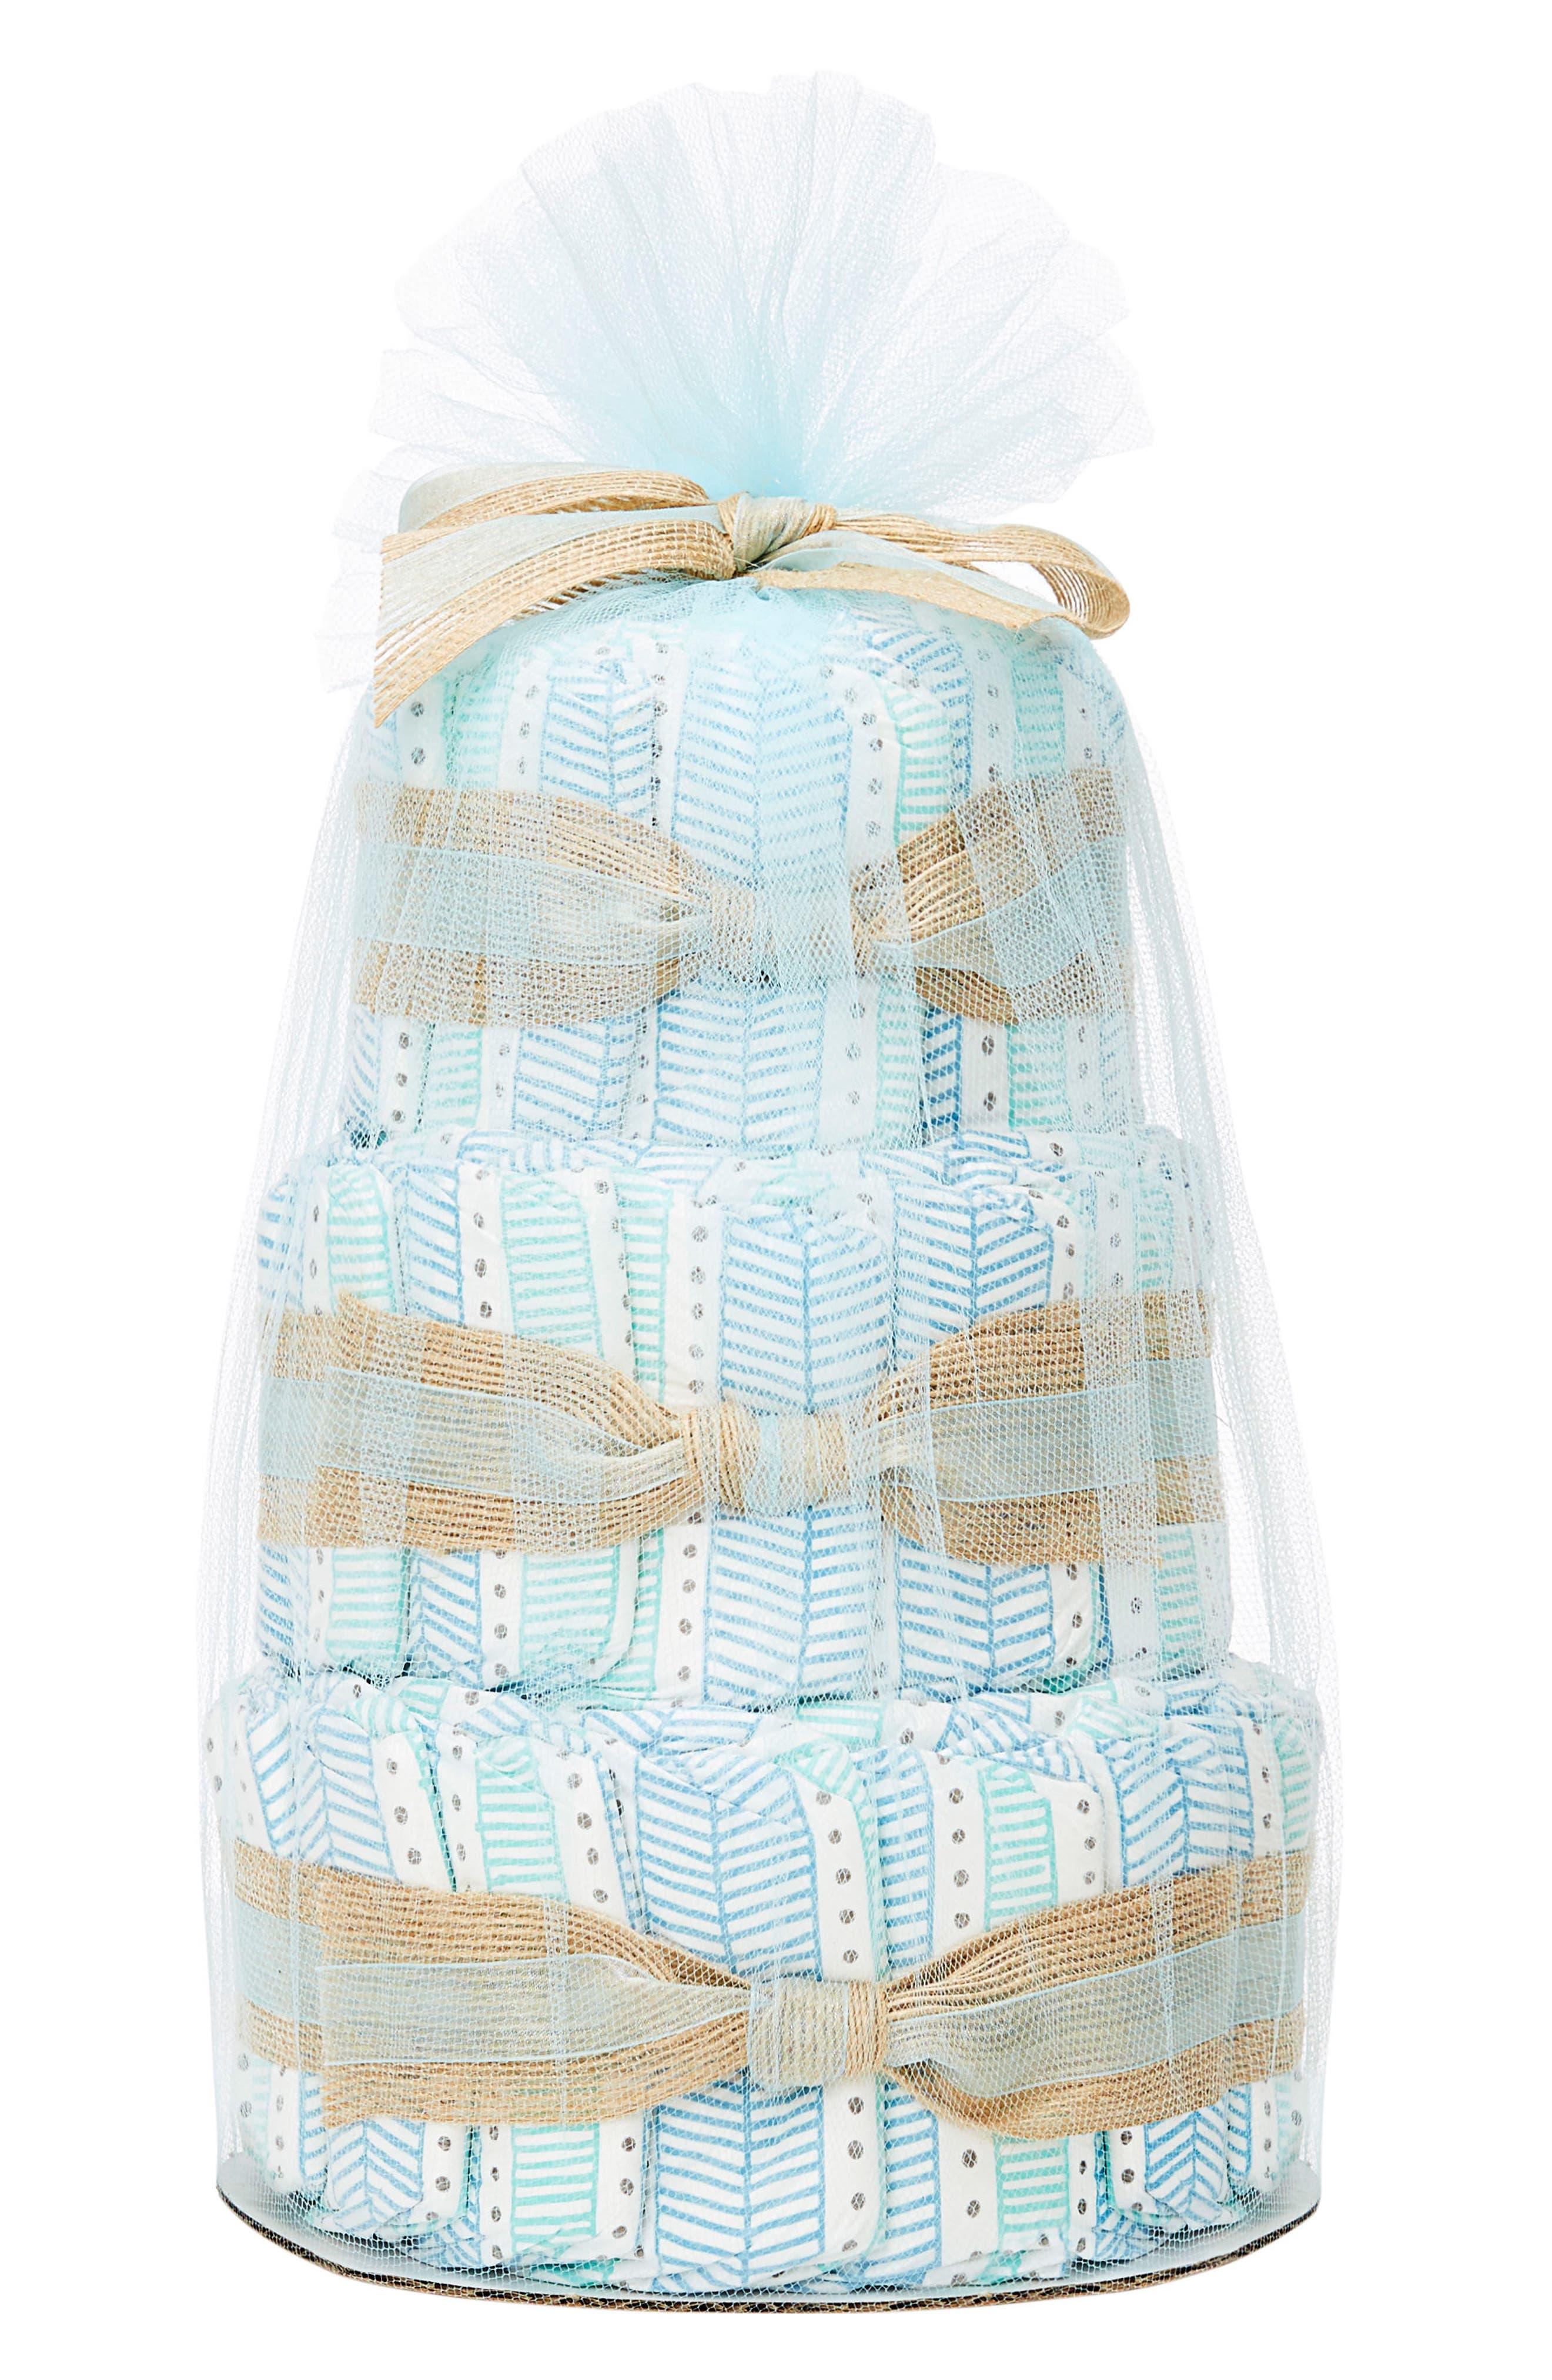 Mini Diaper Cake & Travel-Size Essentials Set,                             Main thumbnail 5, color,